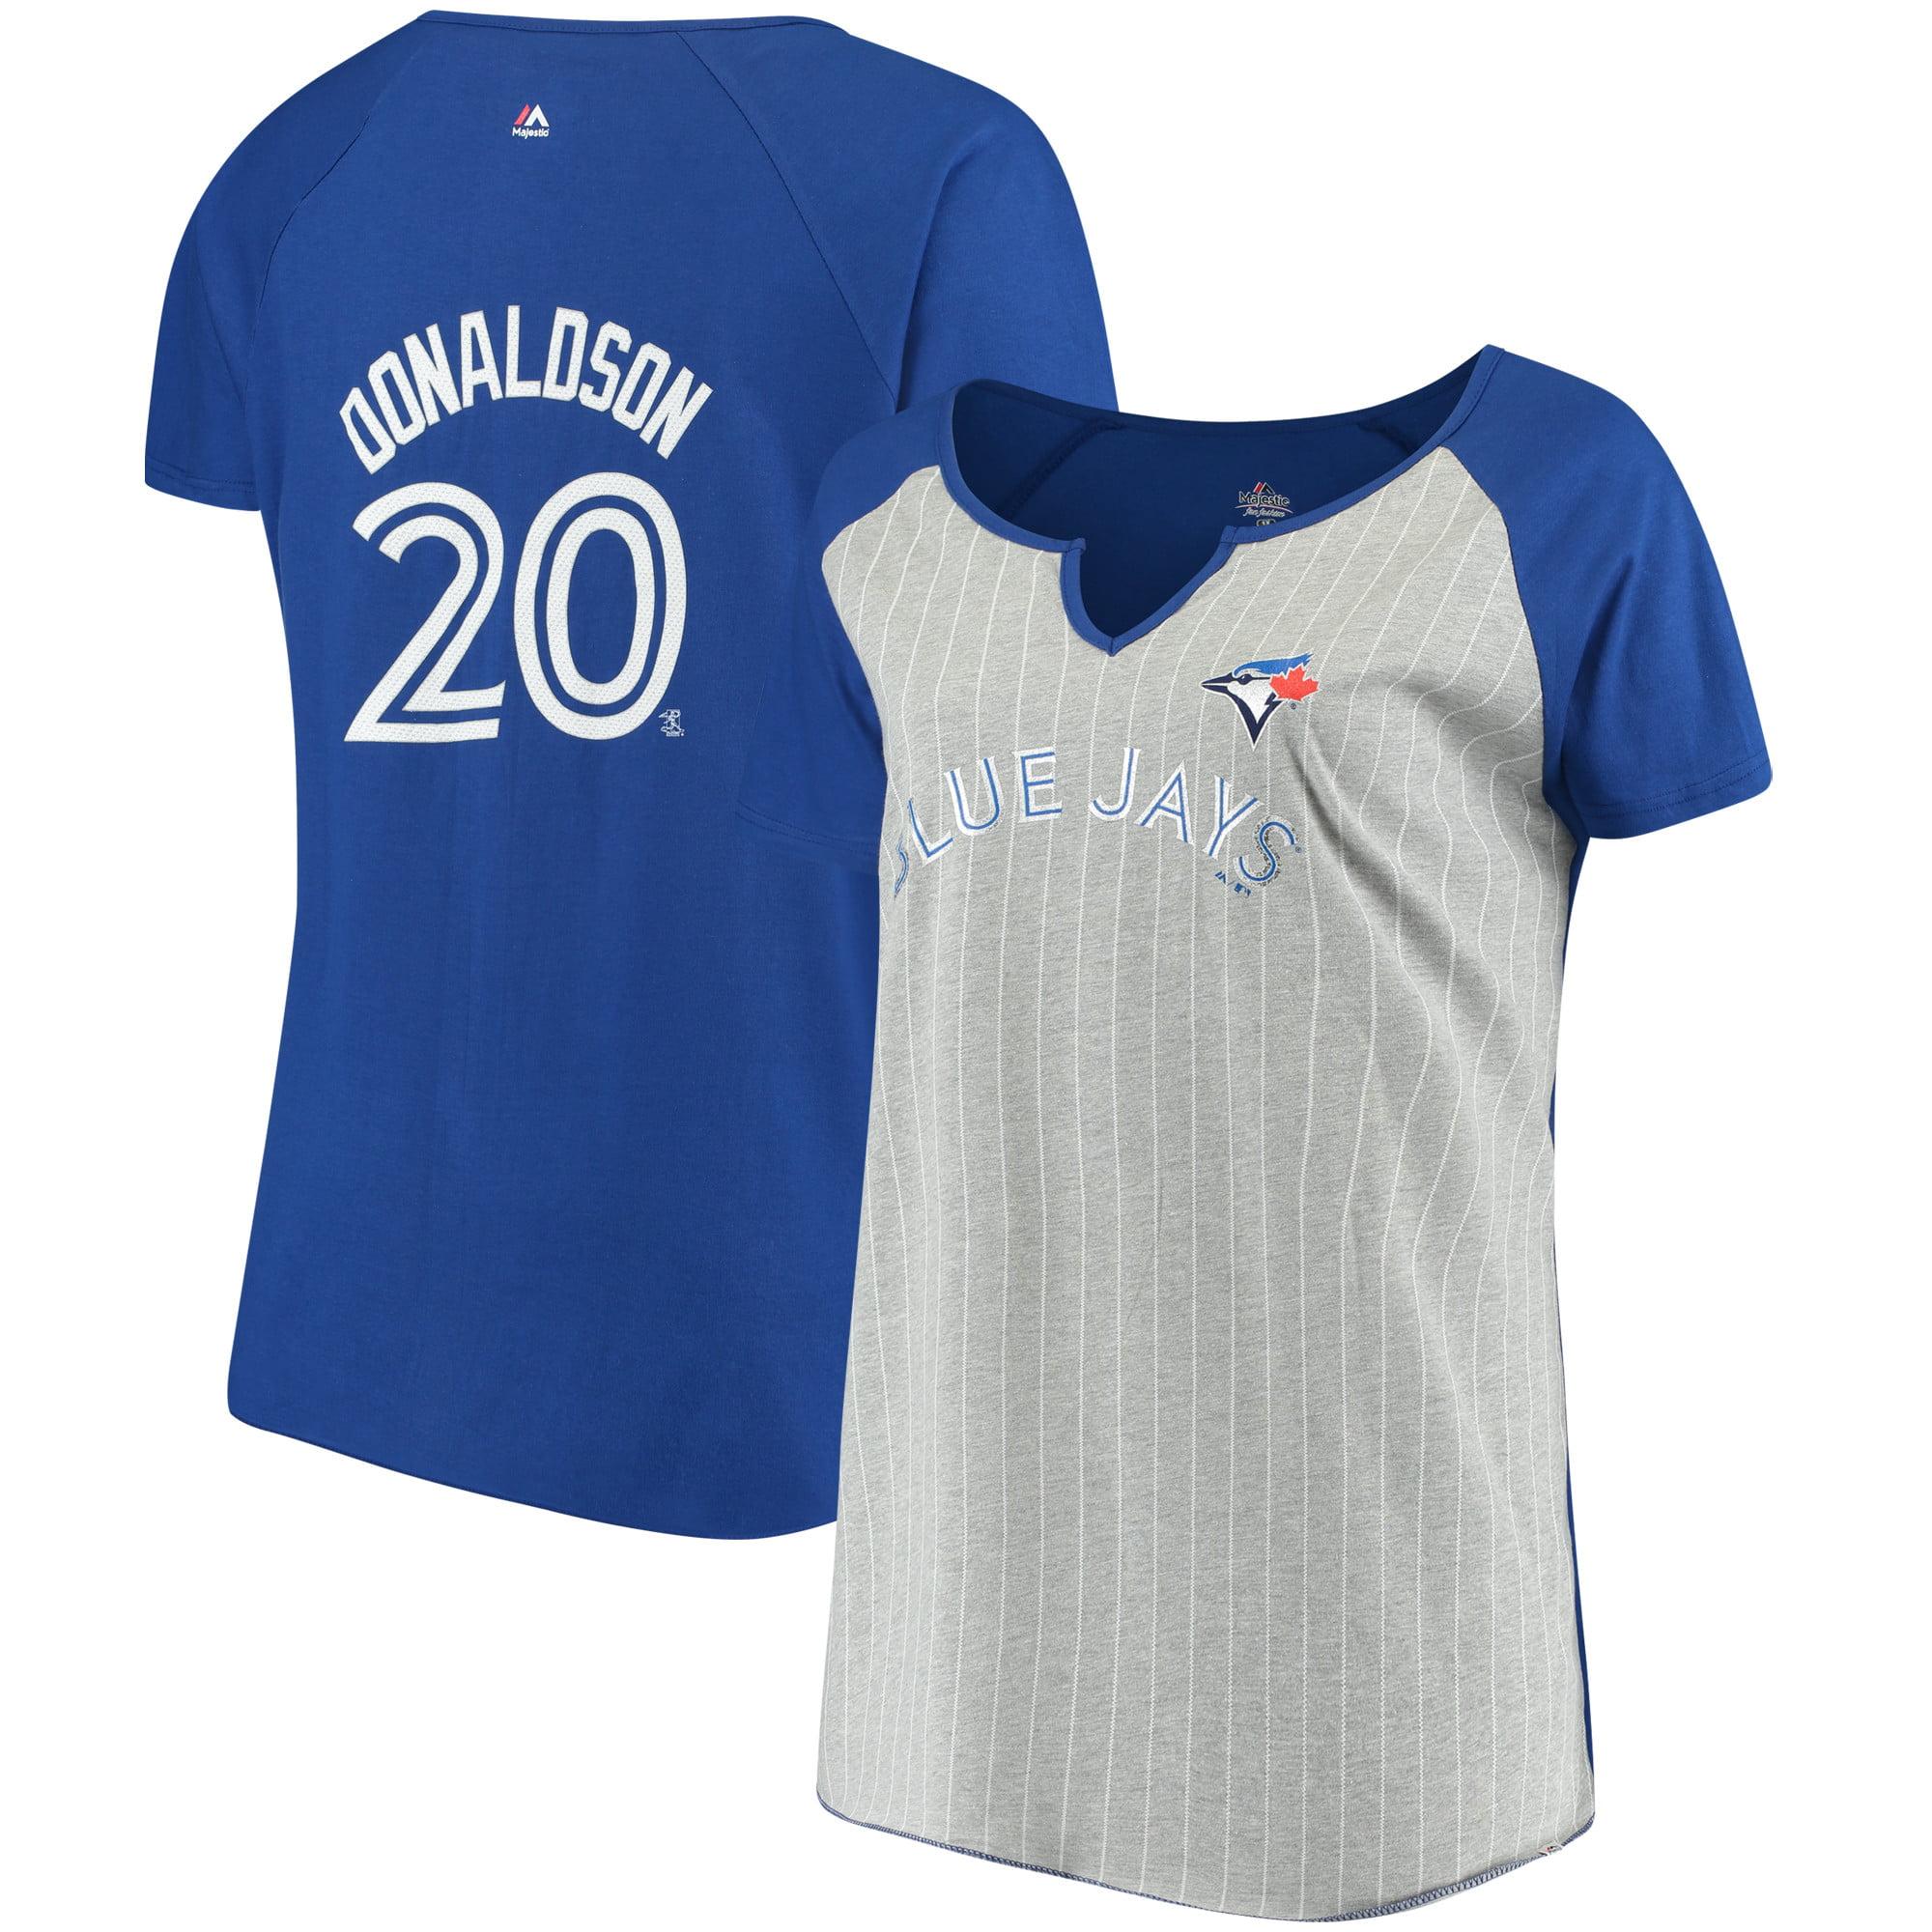 Josh Donaldson Toronto Blue Jays Majestic Women's Plus Size Pinstripe Player T-Shirt - Gray/Royal